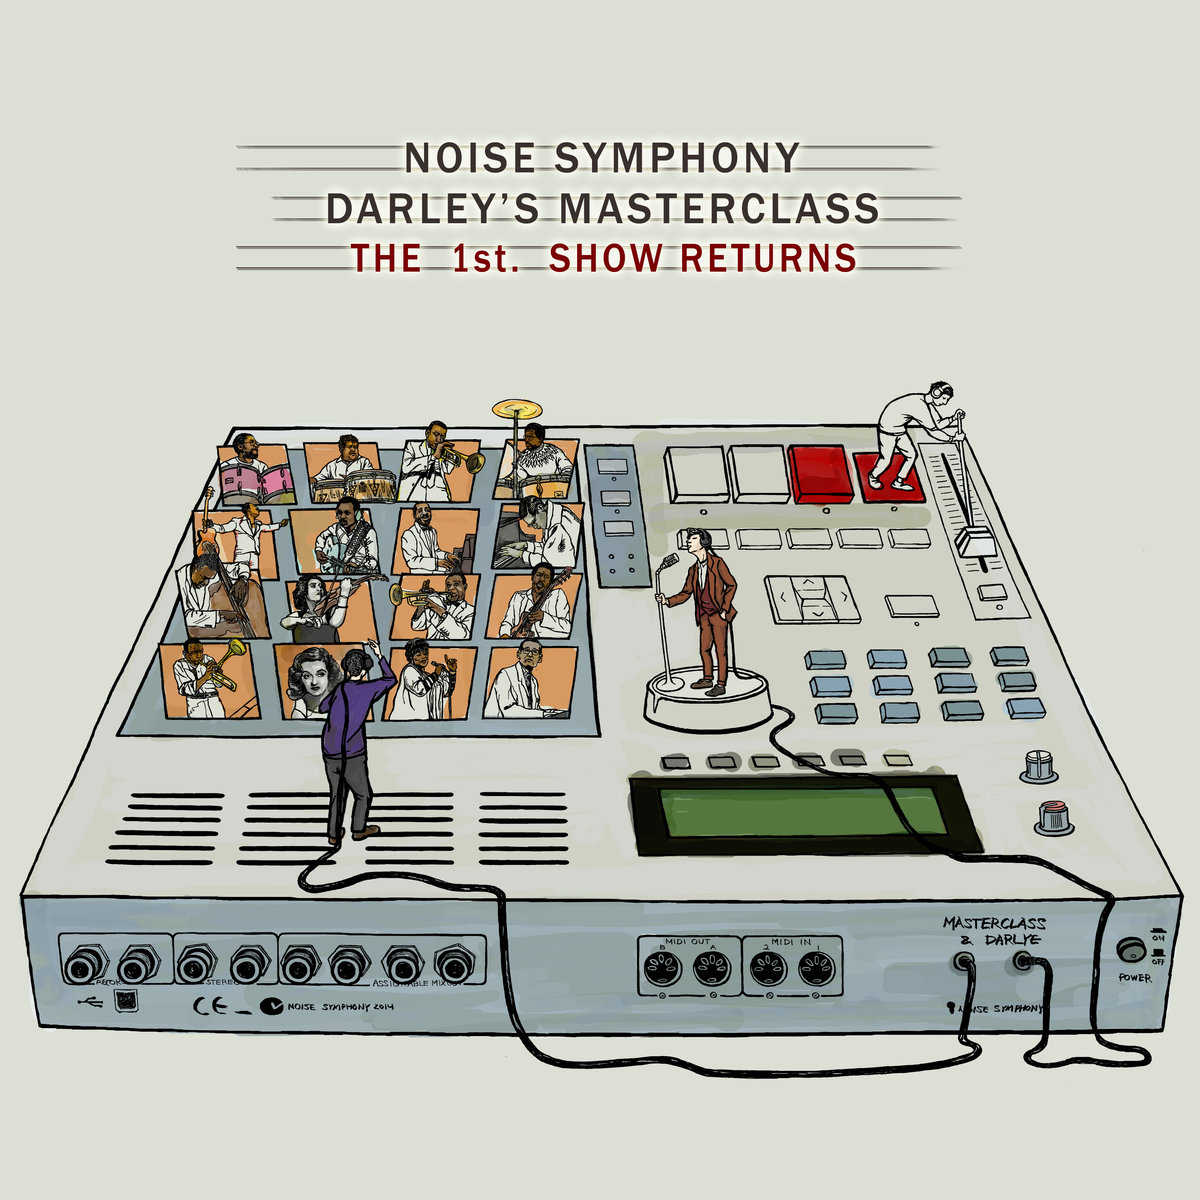 Masterclass & Darley - Hello Hello Hello Hello